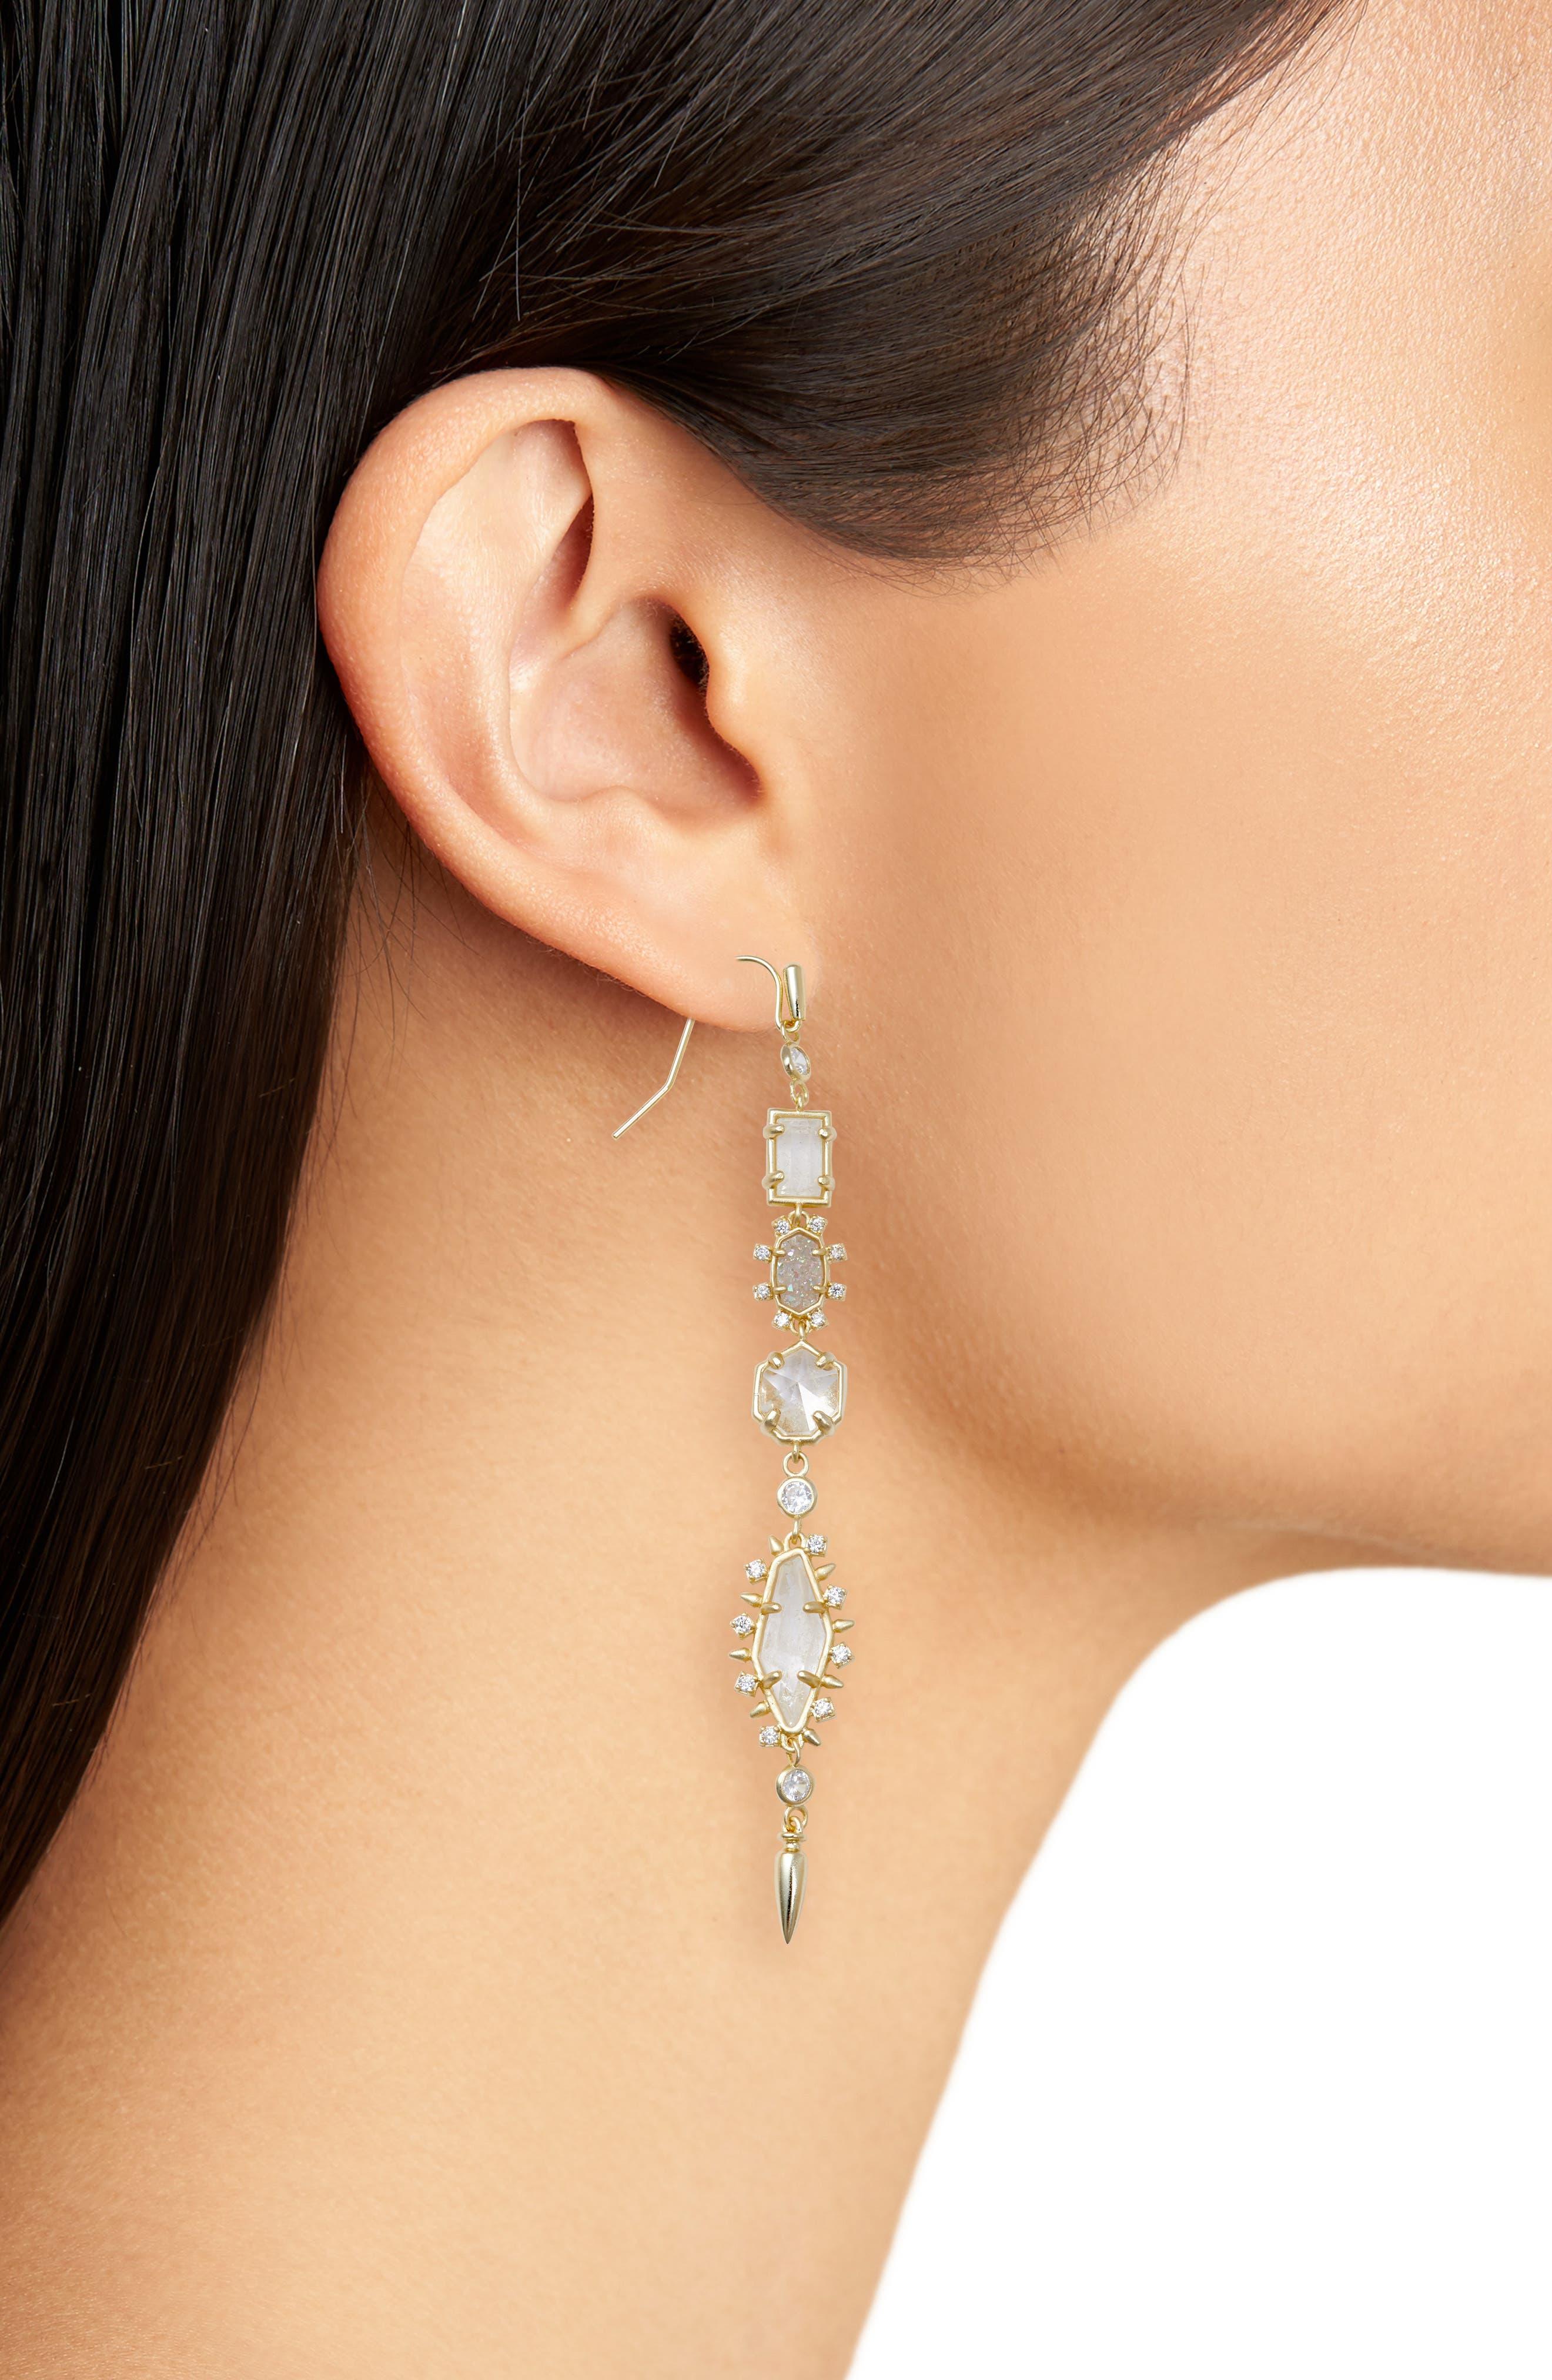 Leandra Linear Earrings,                             Alternate thumbnail 2, color,                             Rock Crystal Mix/ Gold